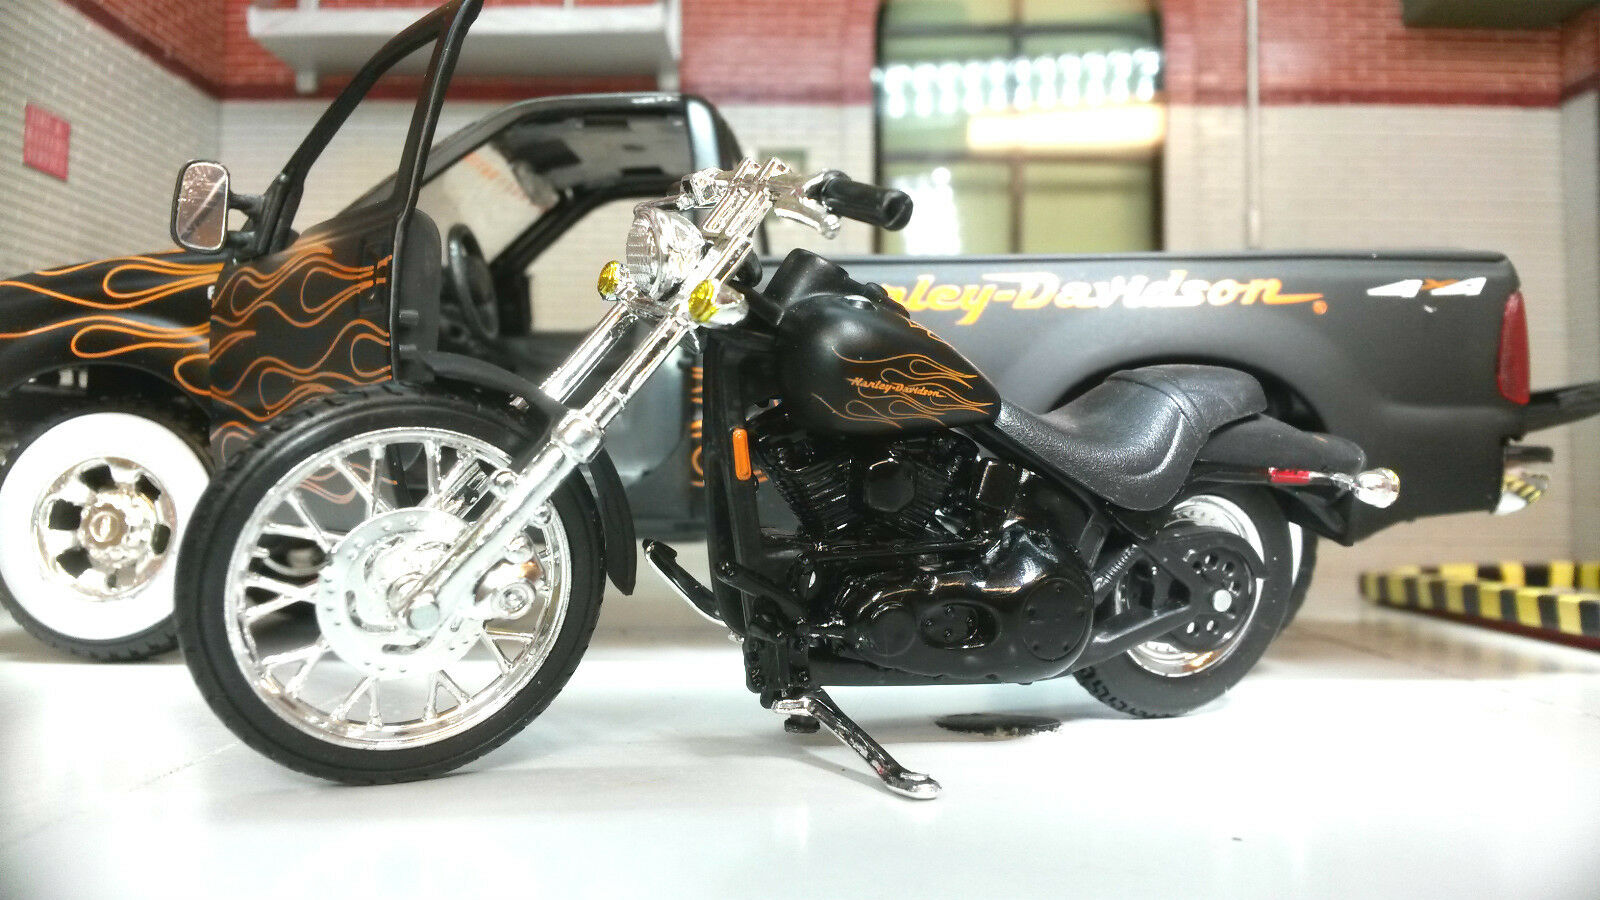 1 24 27 Scala Maisto 32181 Ford F350 & Harley Davidson Fx5tb Modellino Camion